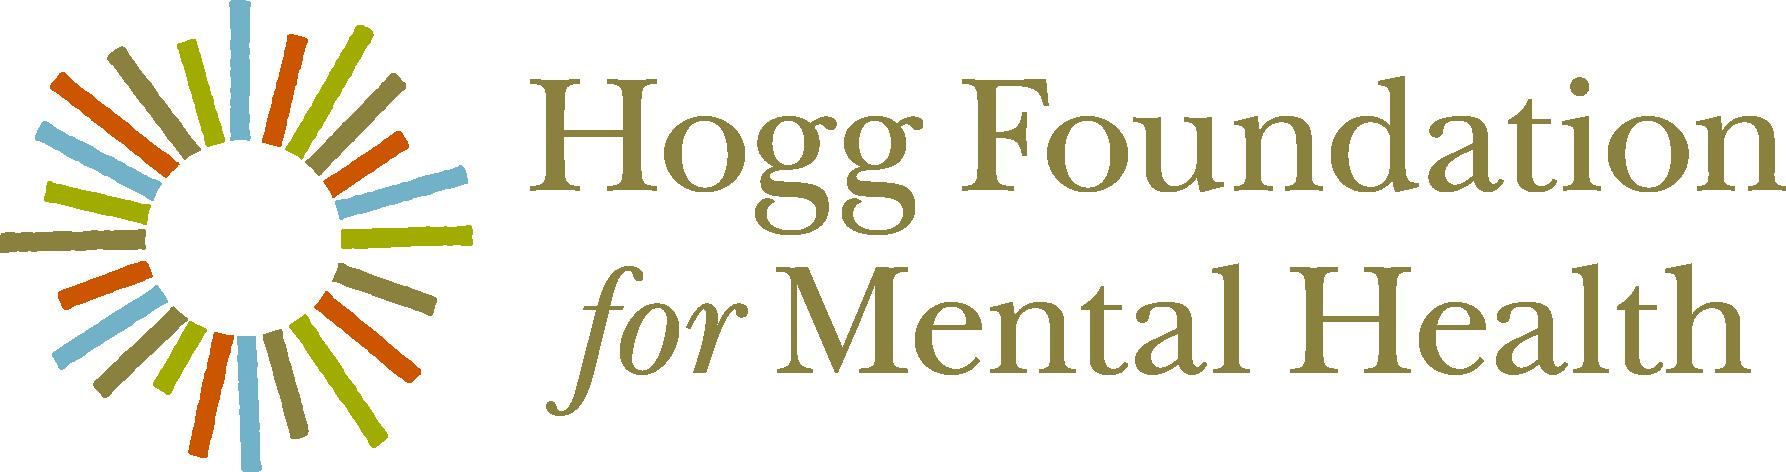 Hogg Foundation for Mental Health | Austin Area African